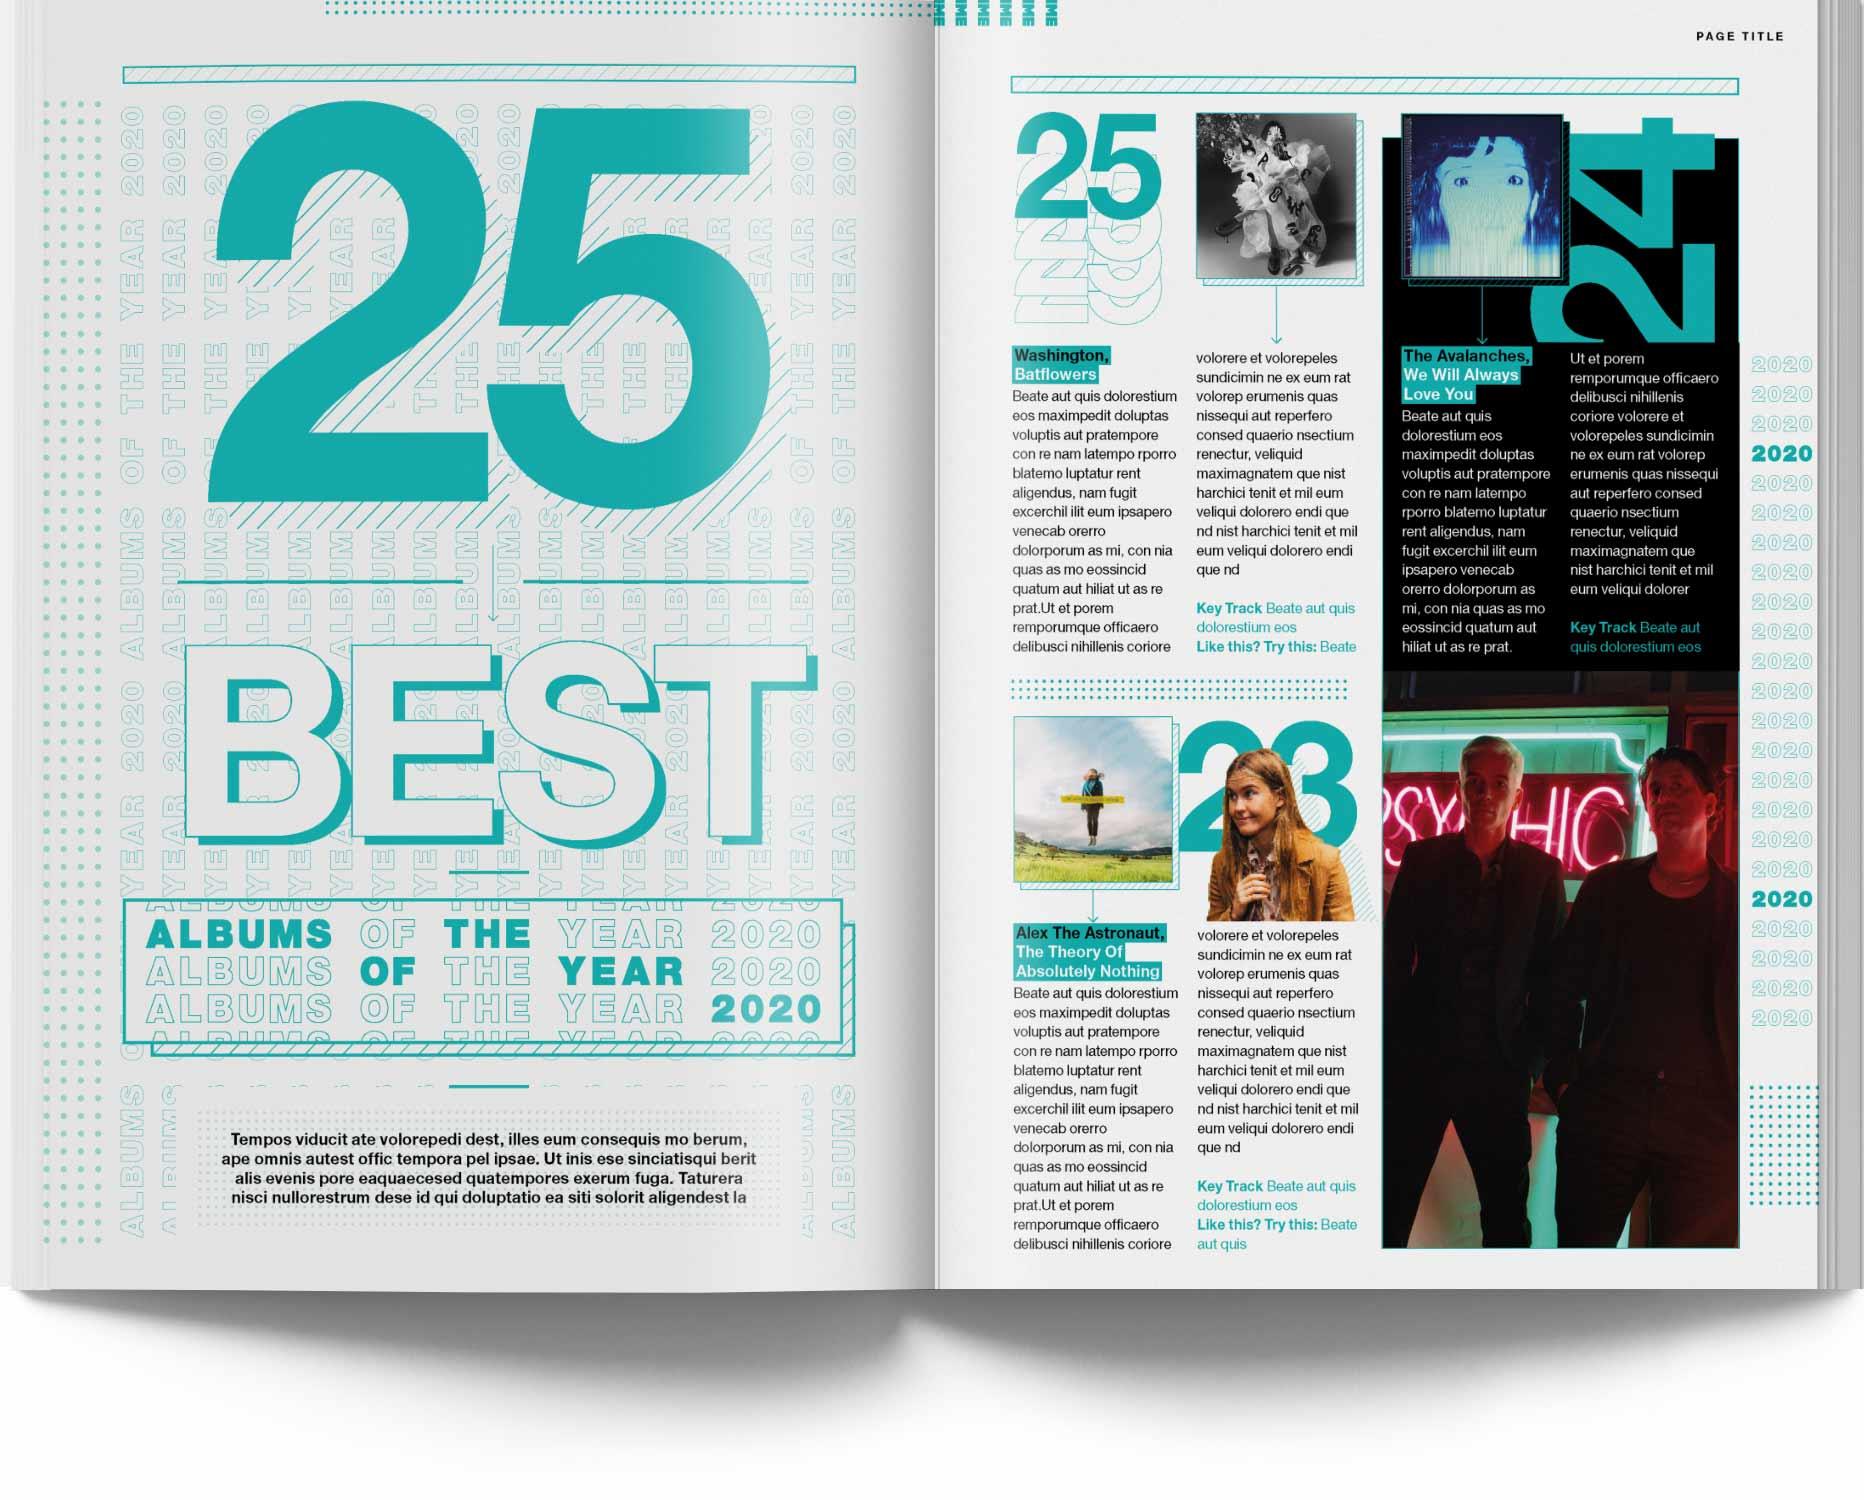 nme australia best albums 2020